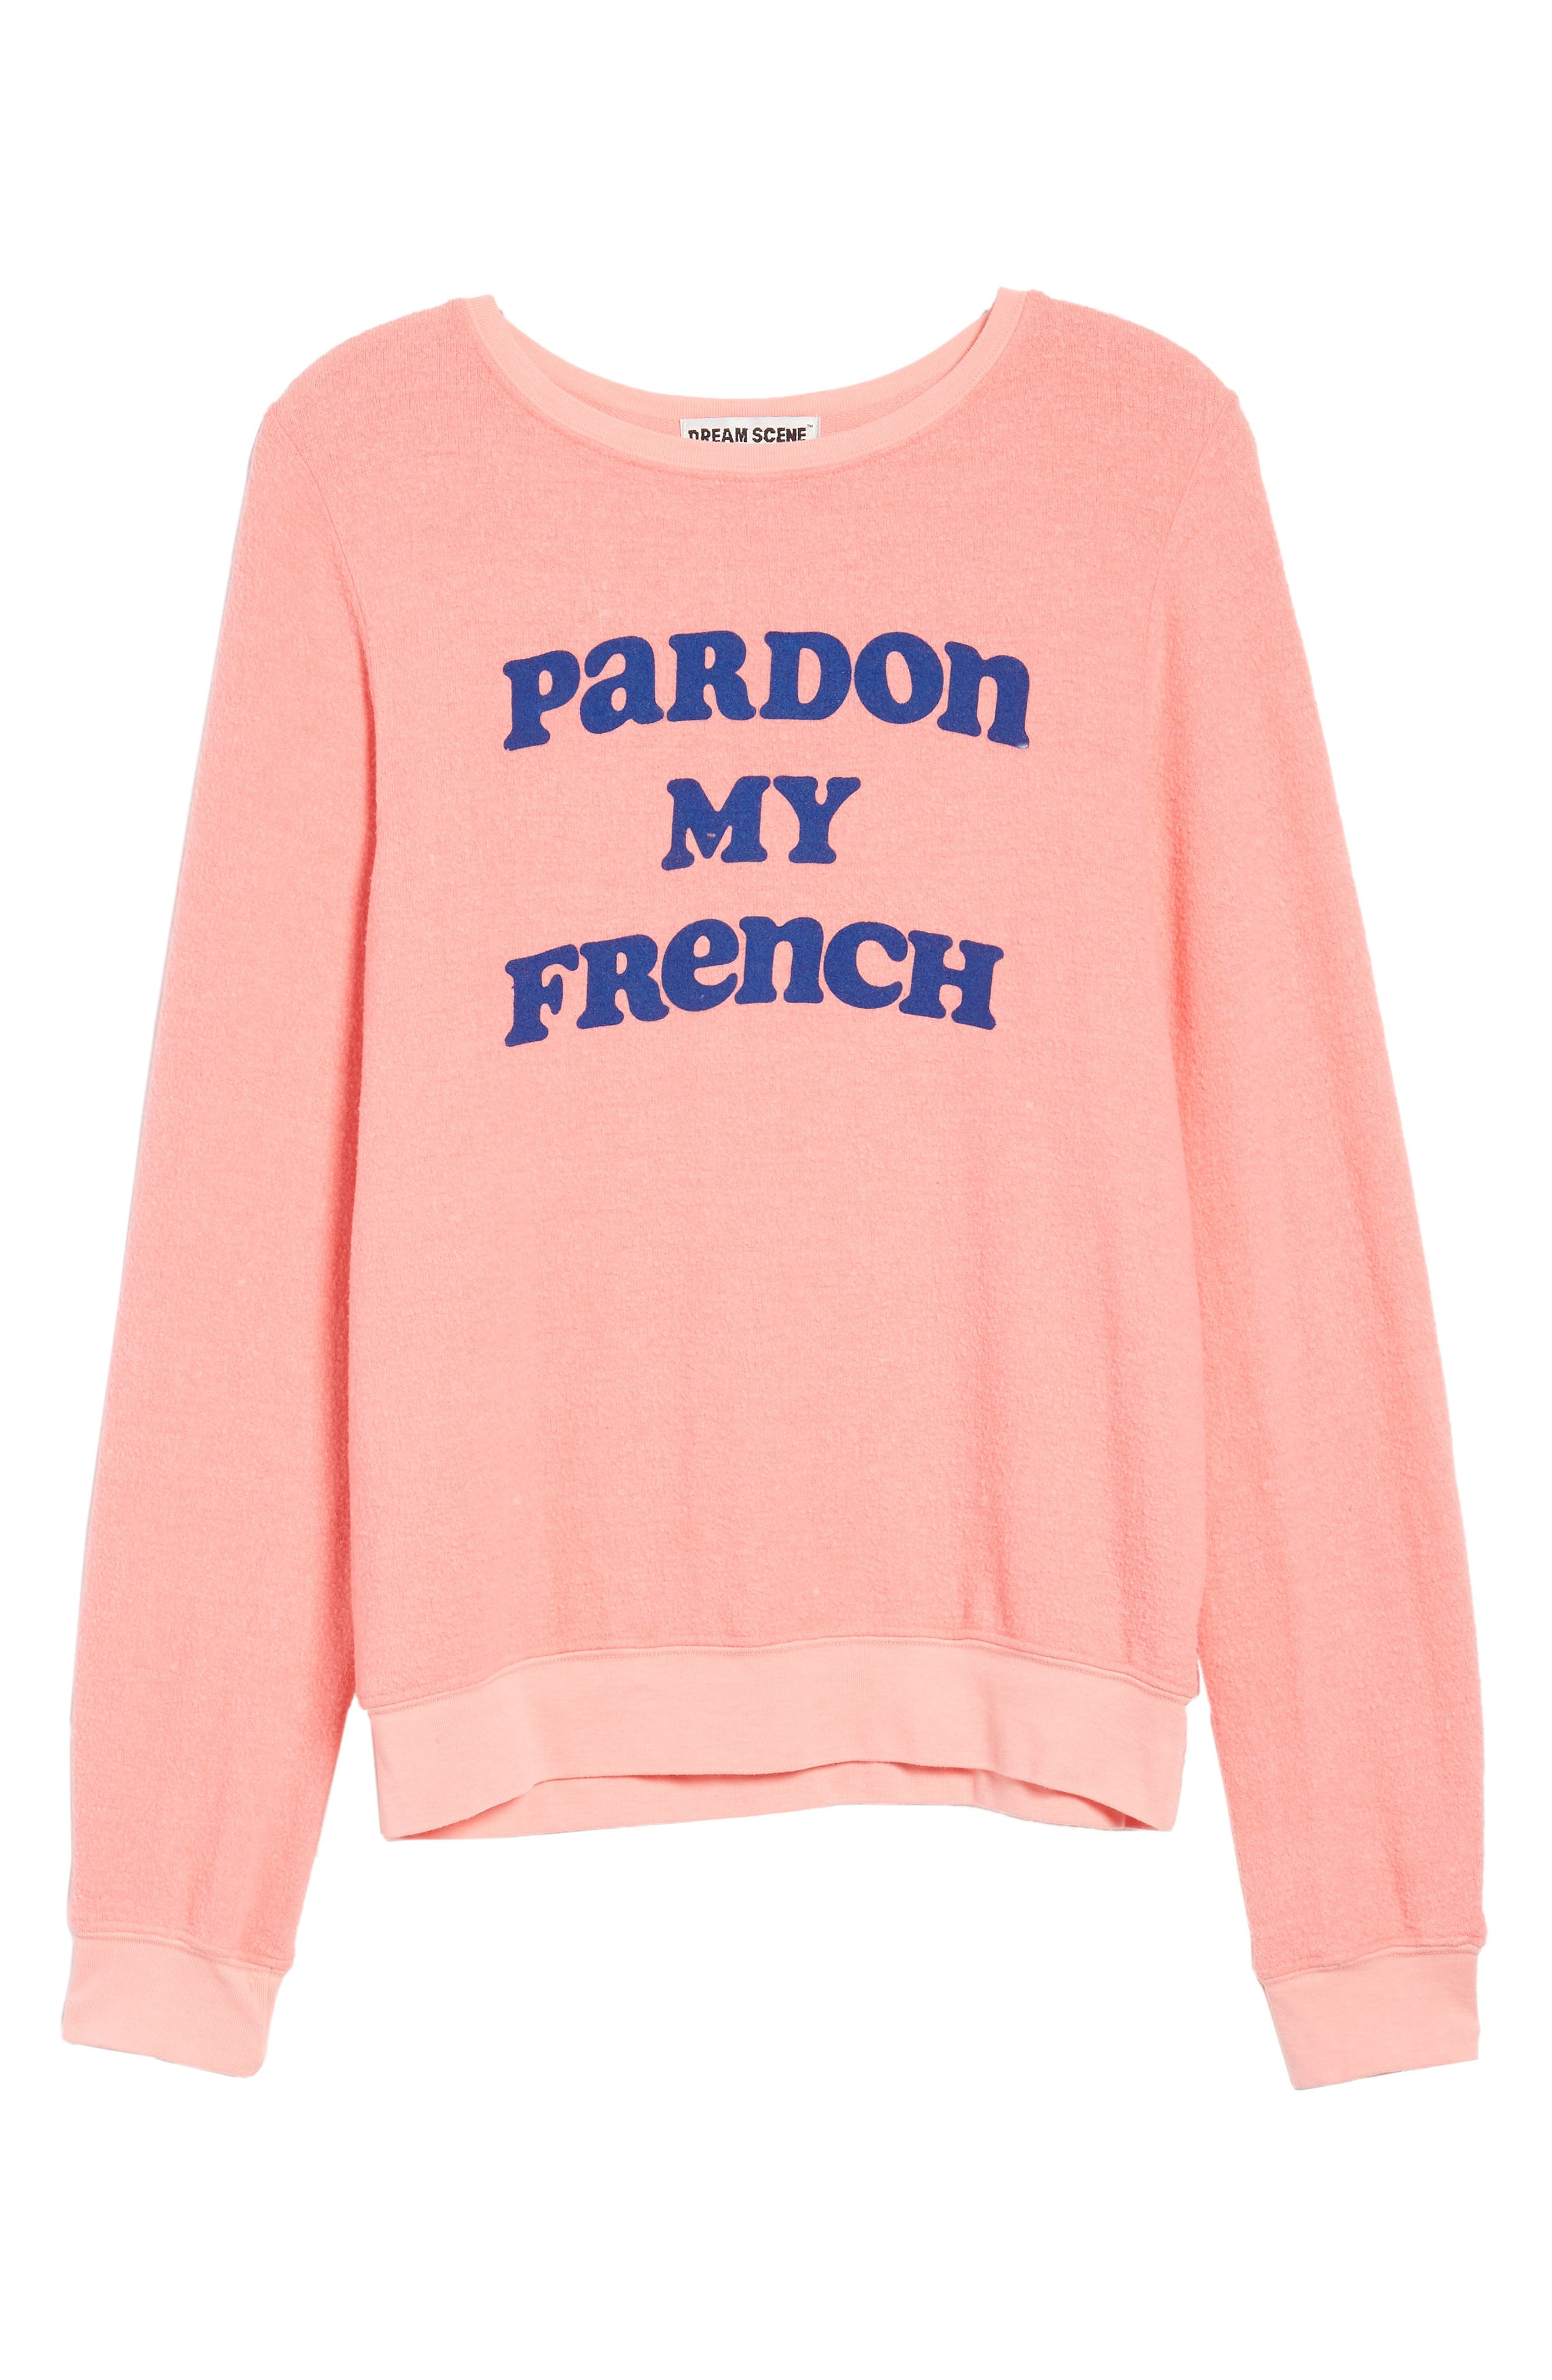 Pardon My French Sweatshirt,                             Alternate thumbnail 7, color,                             Peach Crush